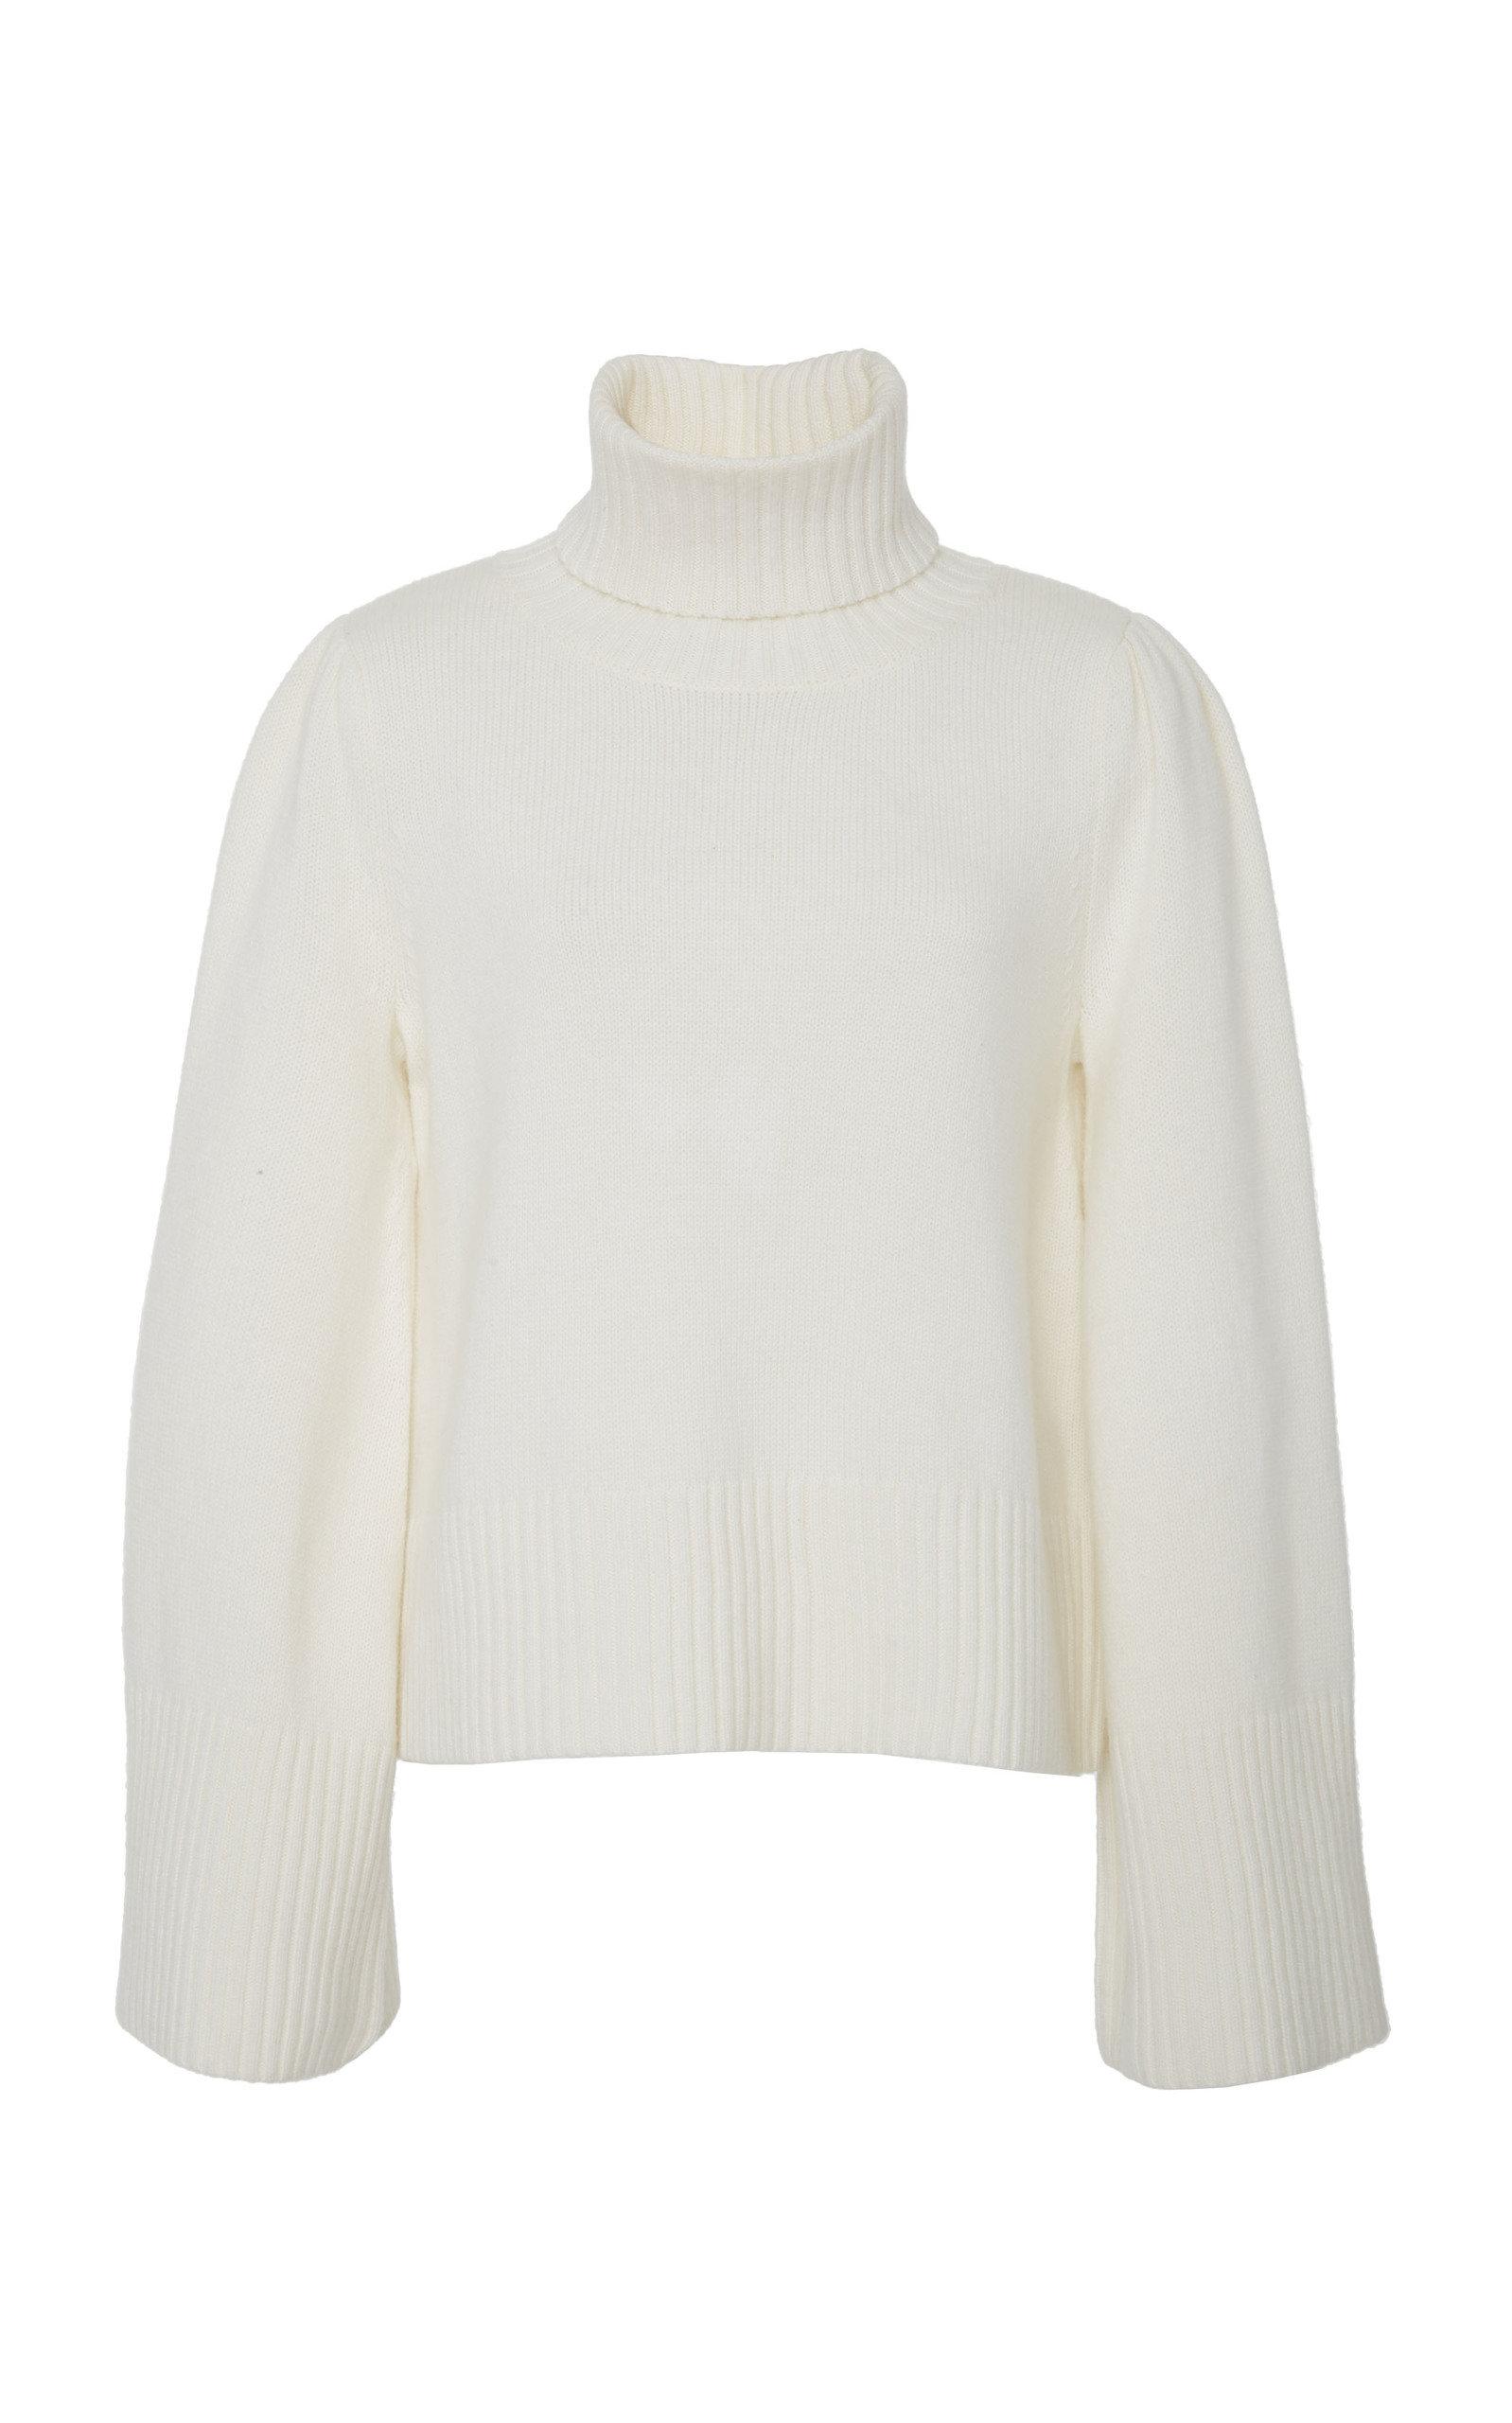 Essentials Flare Sleeve Wool & Cashmere Turtleneck Sweater in White